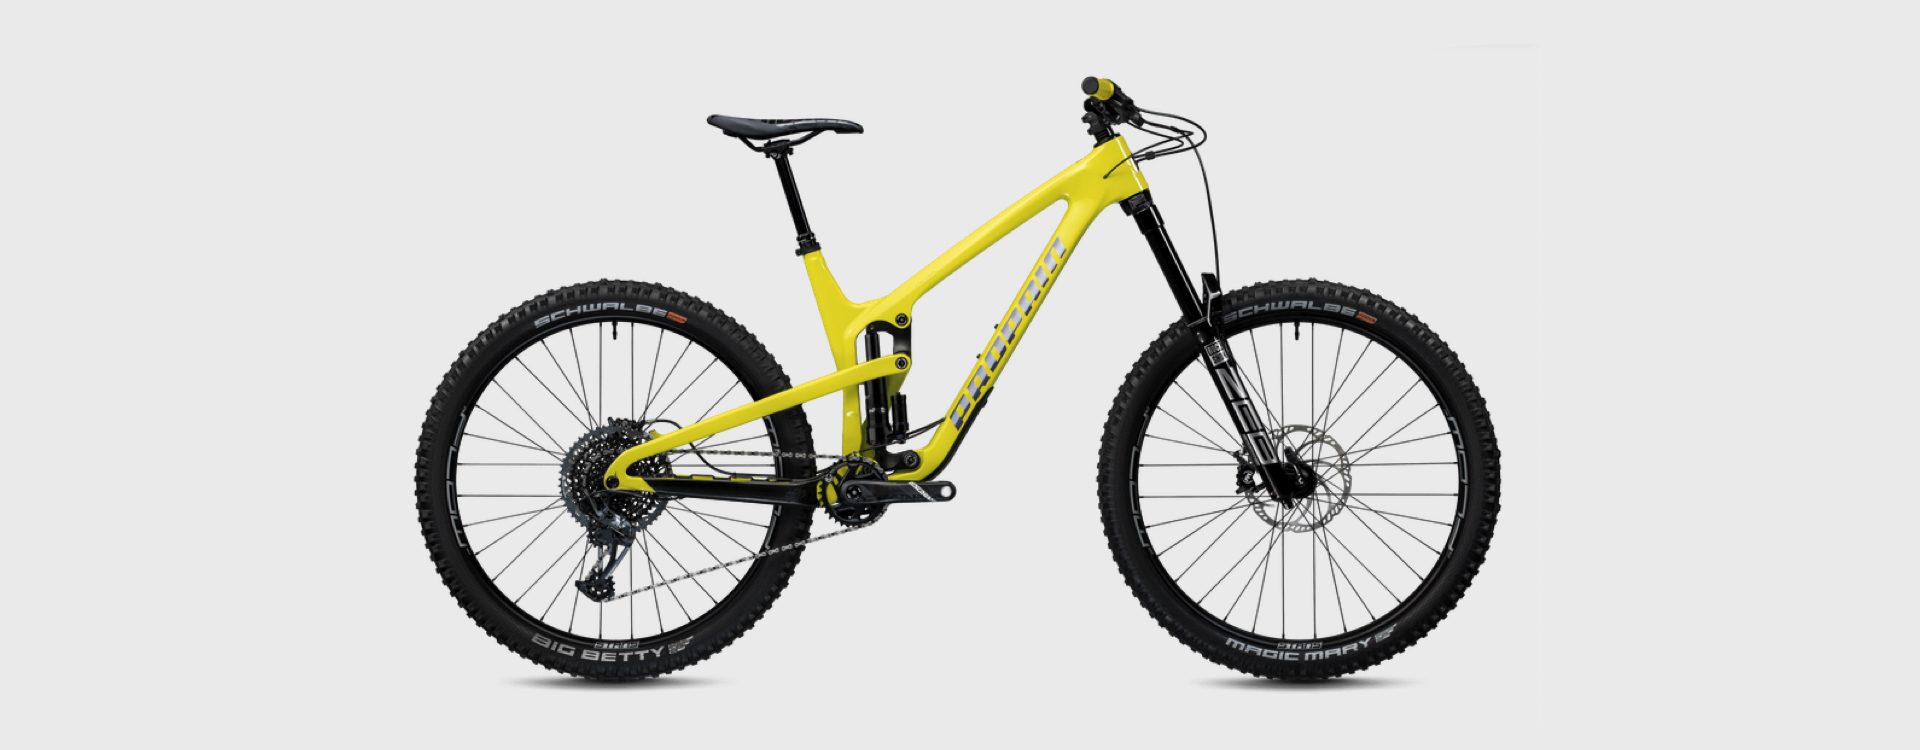 Bike Verleih Gummersbach Propain Bikes Testcenter NRW Spindrift 2 - CF - M - 29 - Lime - 1920x750